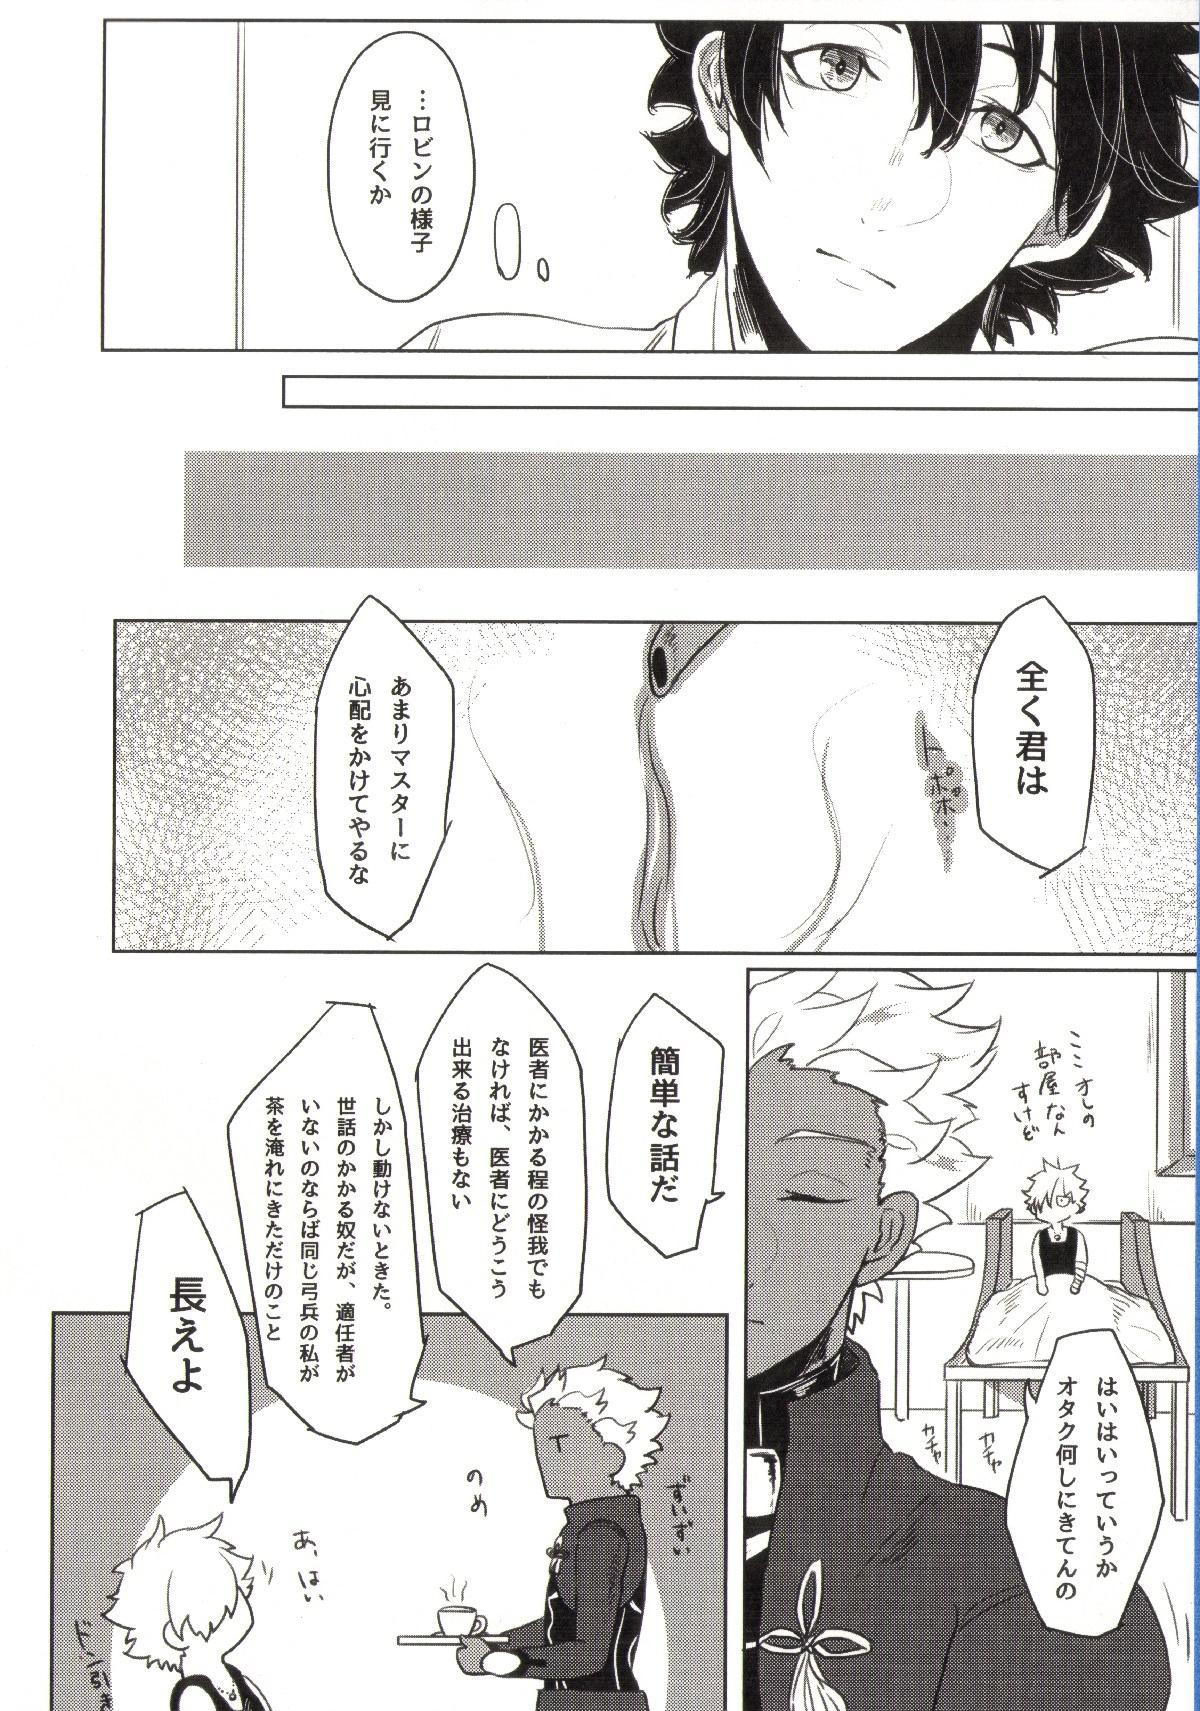 REASON/ANSWER 33